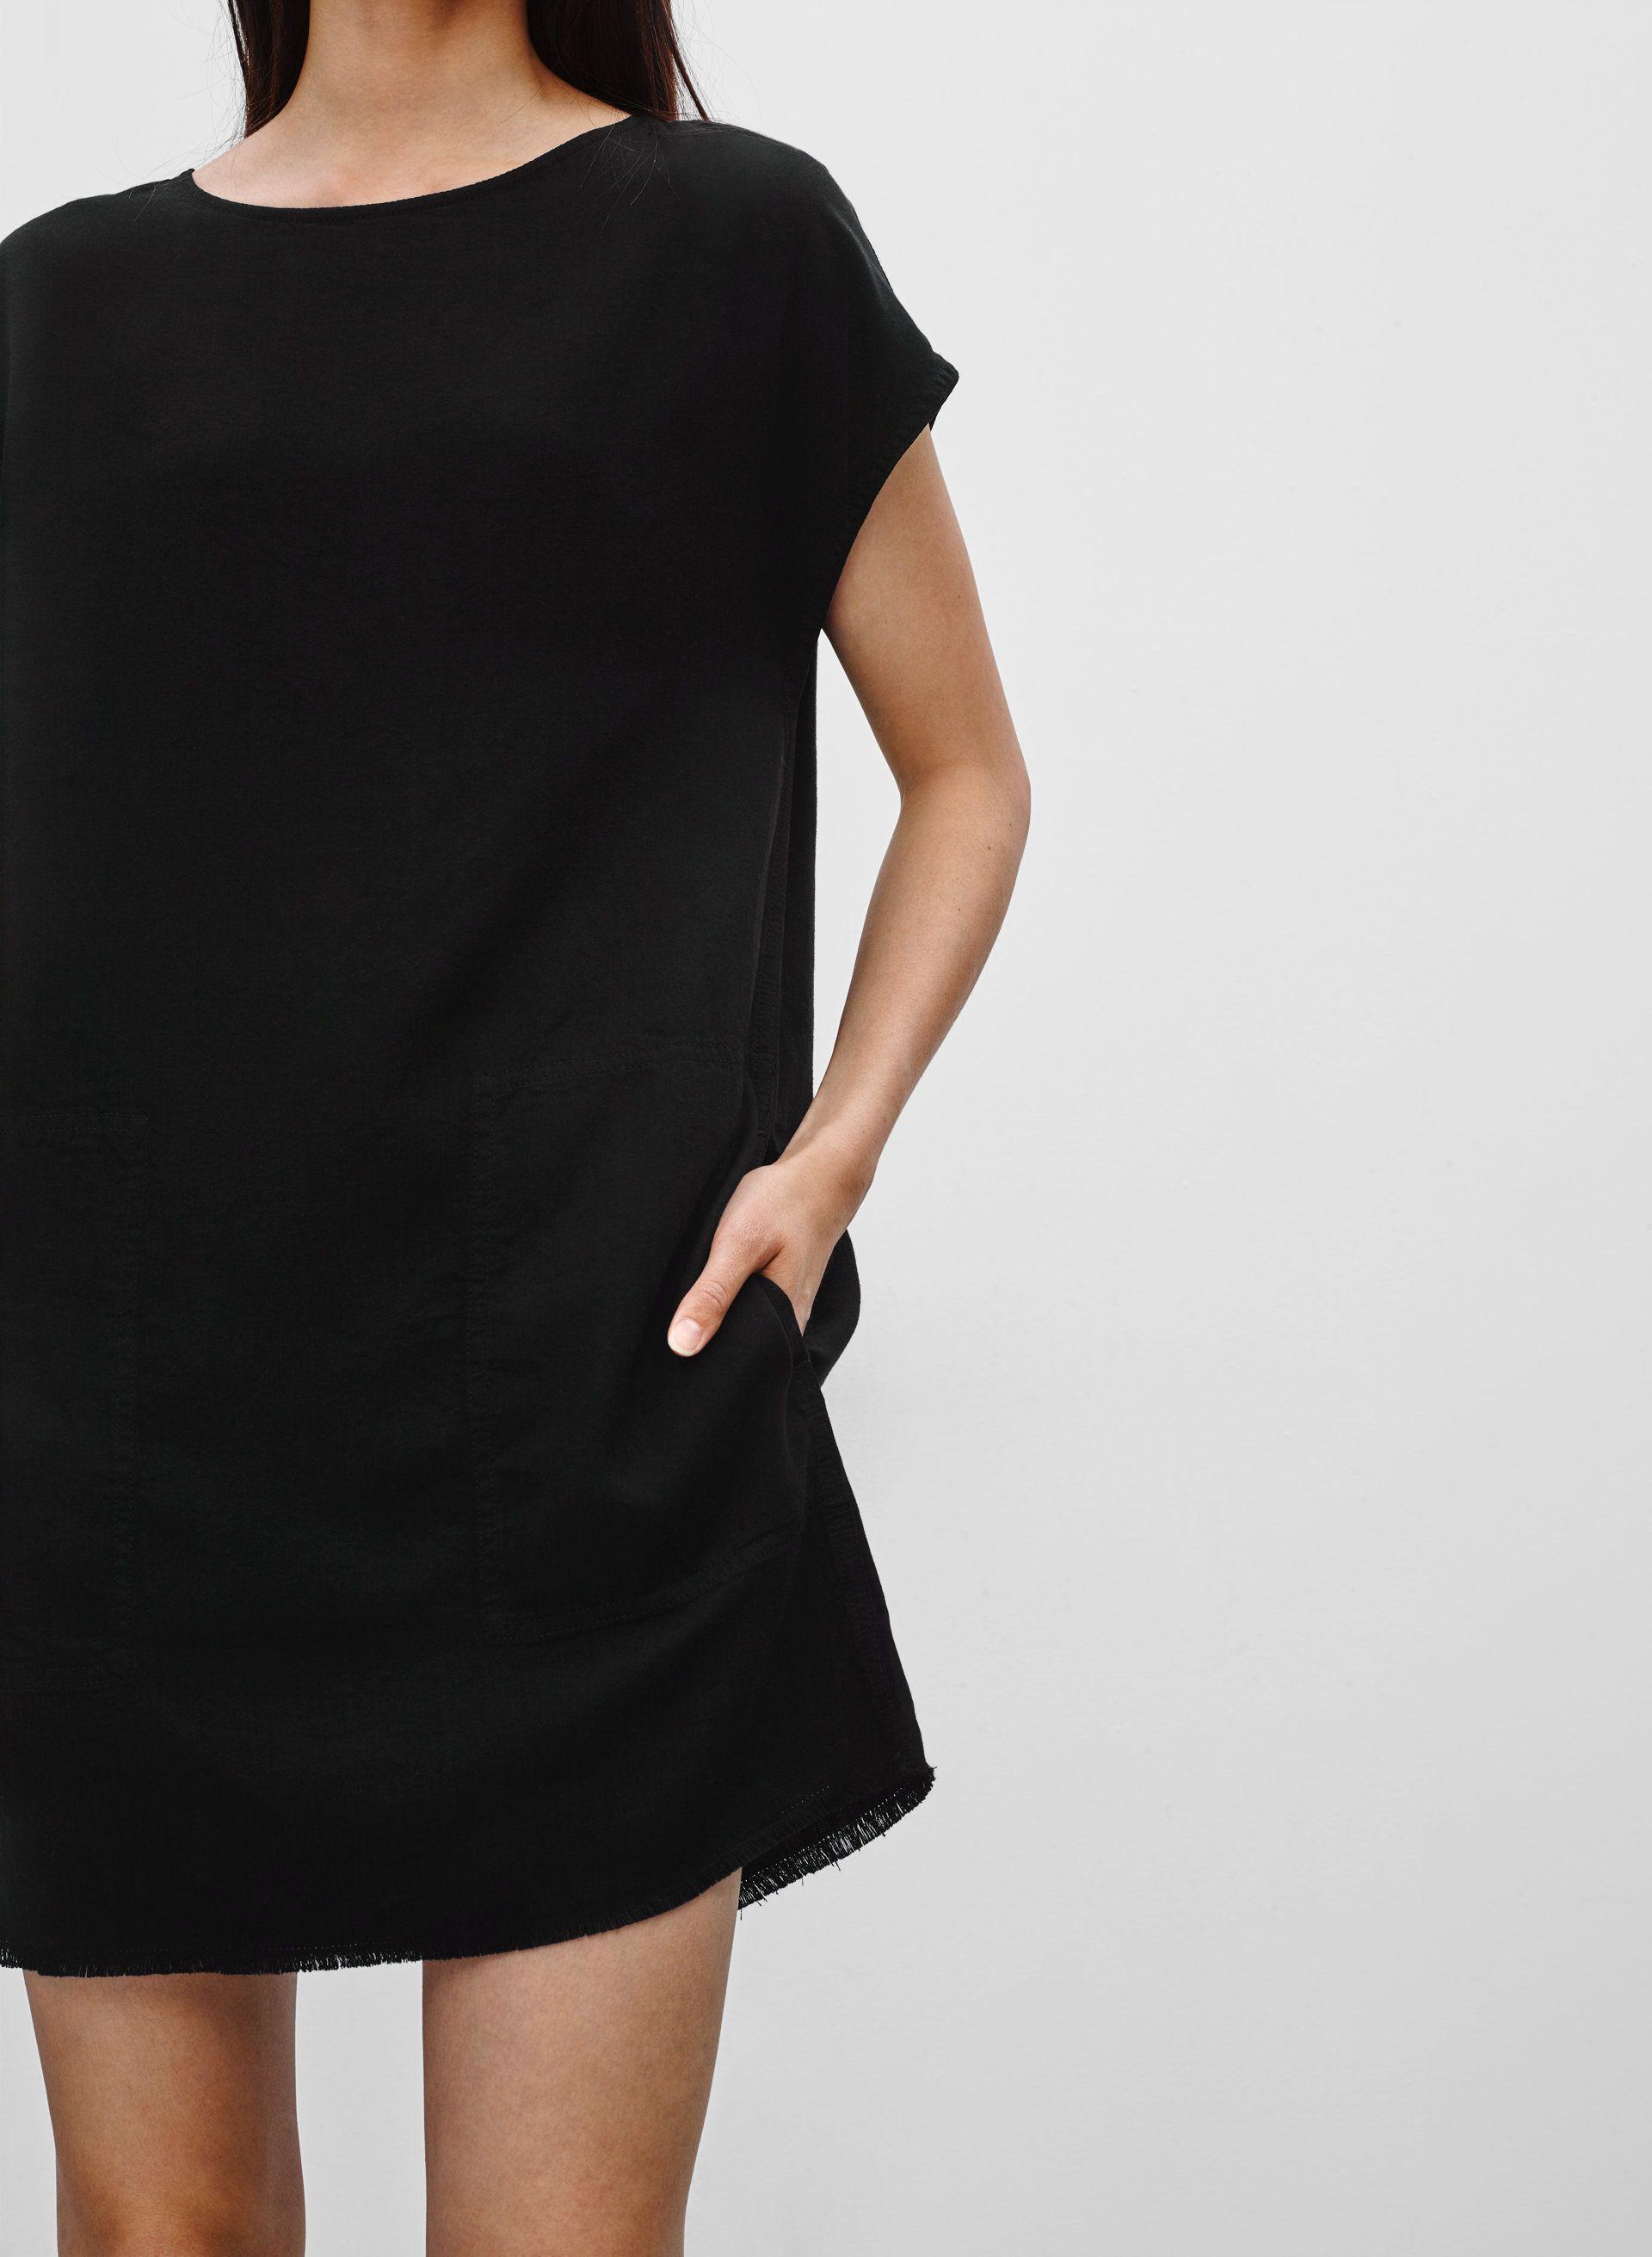 knotted shift dress - Black Reality Studio Sale Really JQSAk77